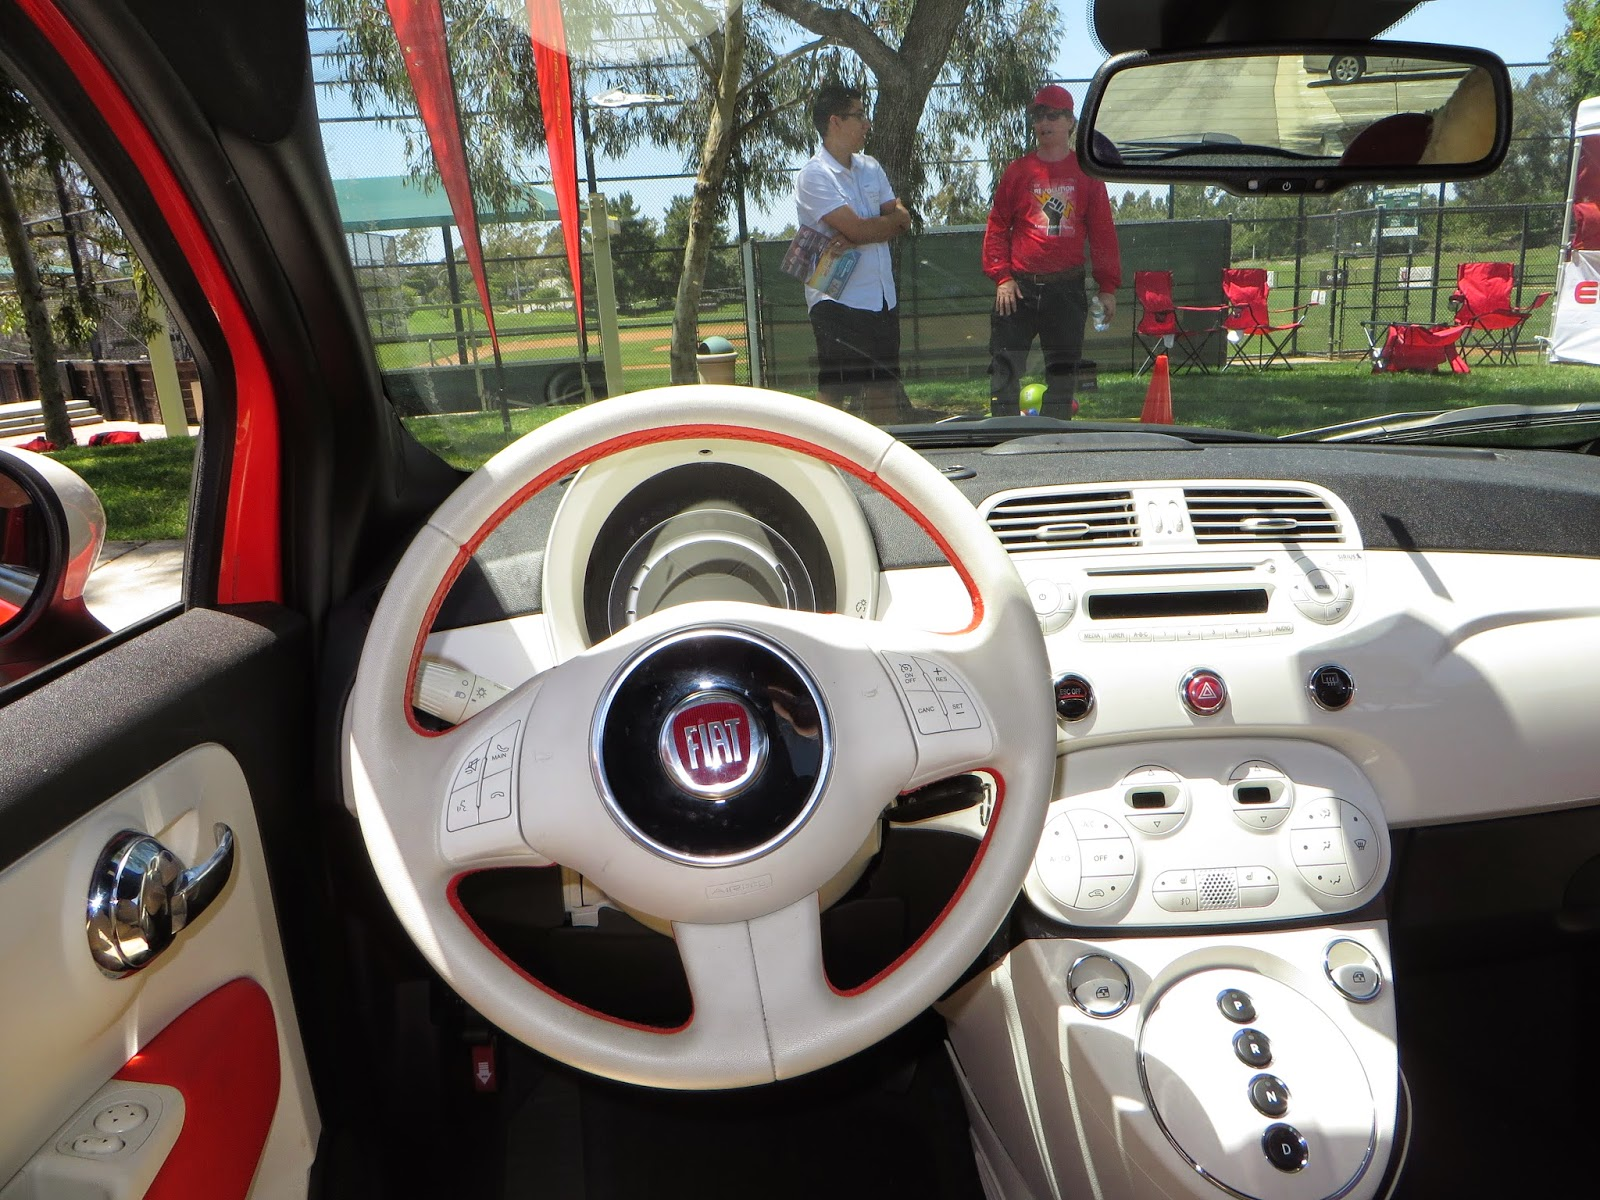 Italian Electric Car Dash Interior Steering Wheel